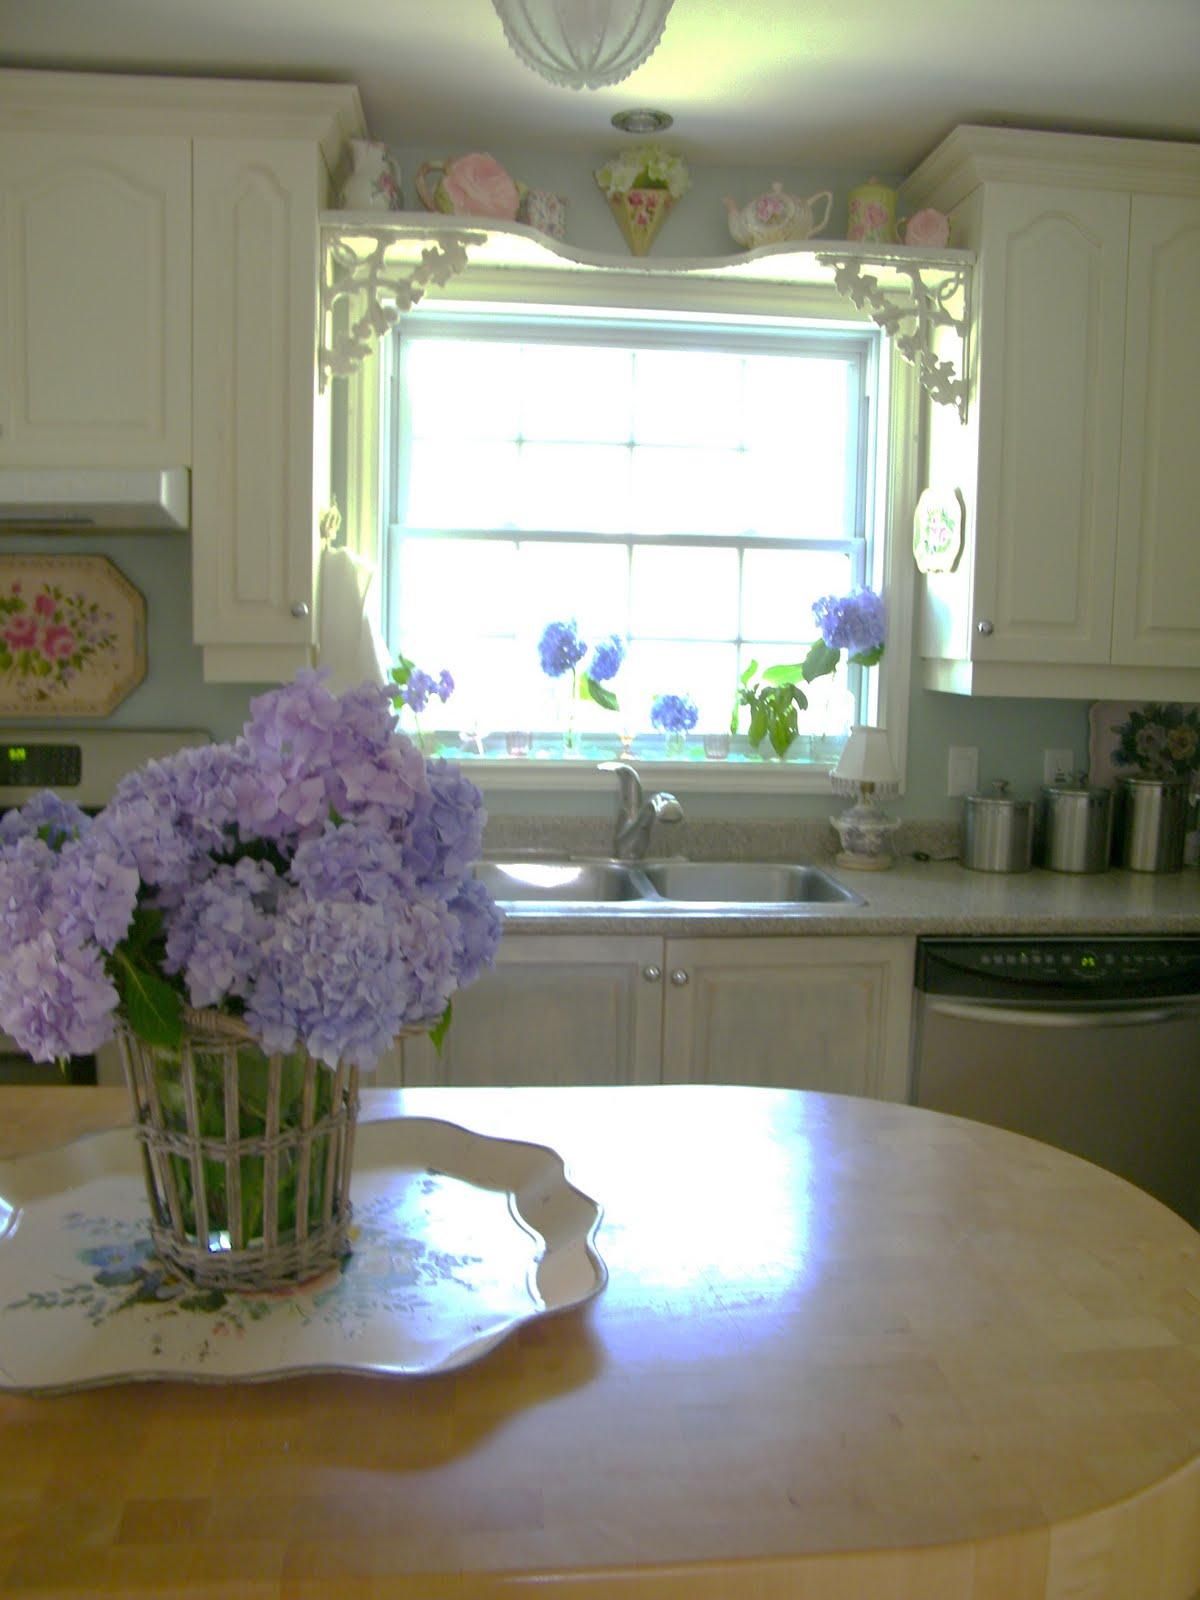 Maison Decor Blue Hydrangeas And Pink Glass